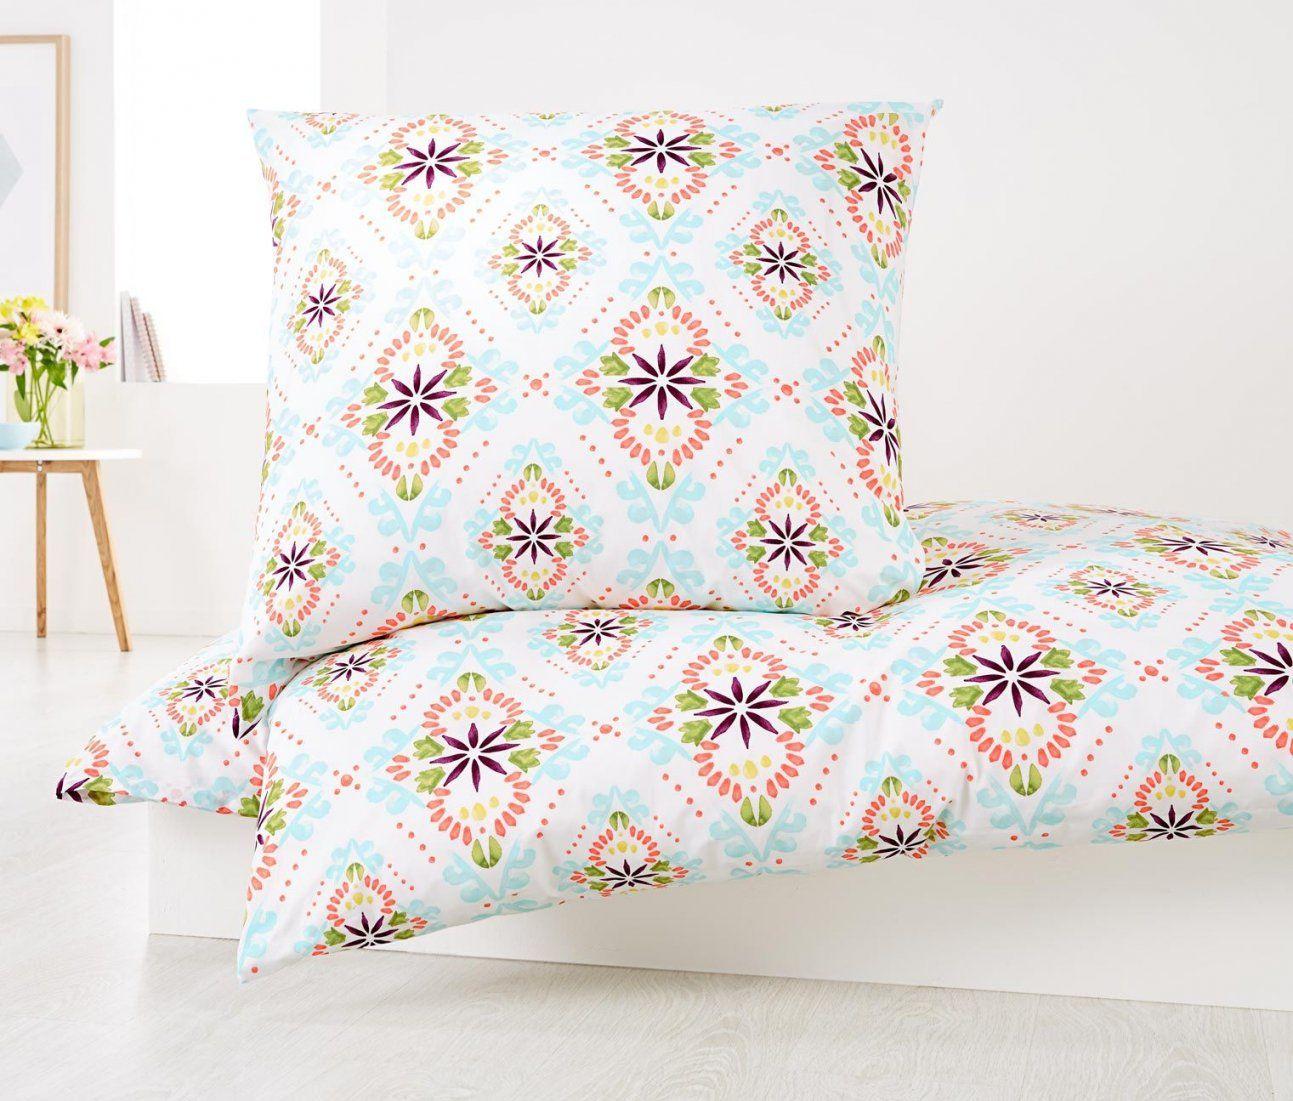 perkal bettw sche tchibo haus design ideen. Black Bedroom Furniture Sets. Home Design Ideas